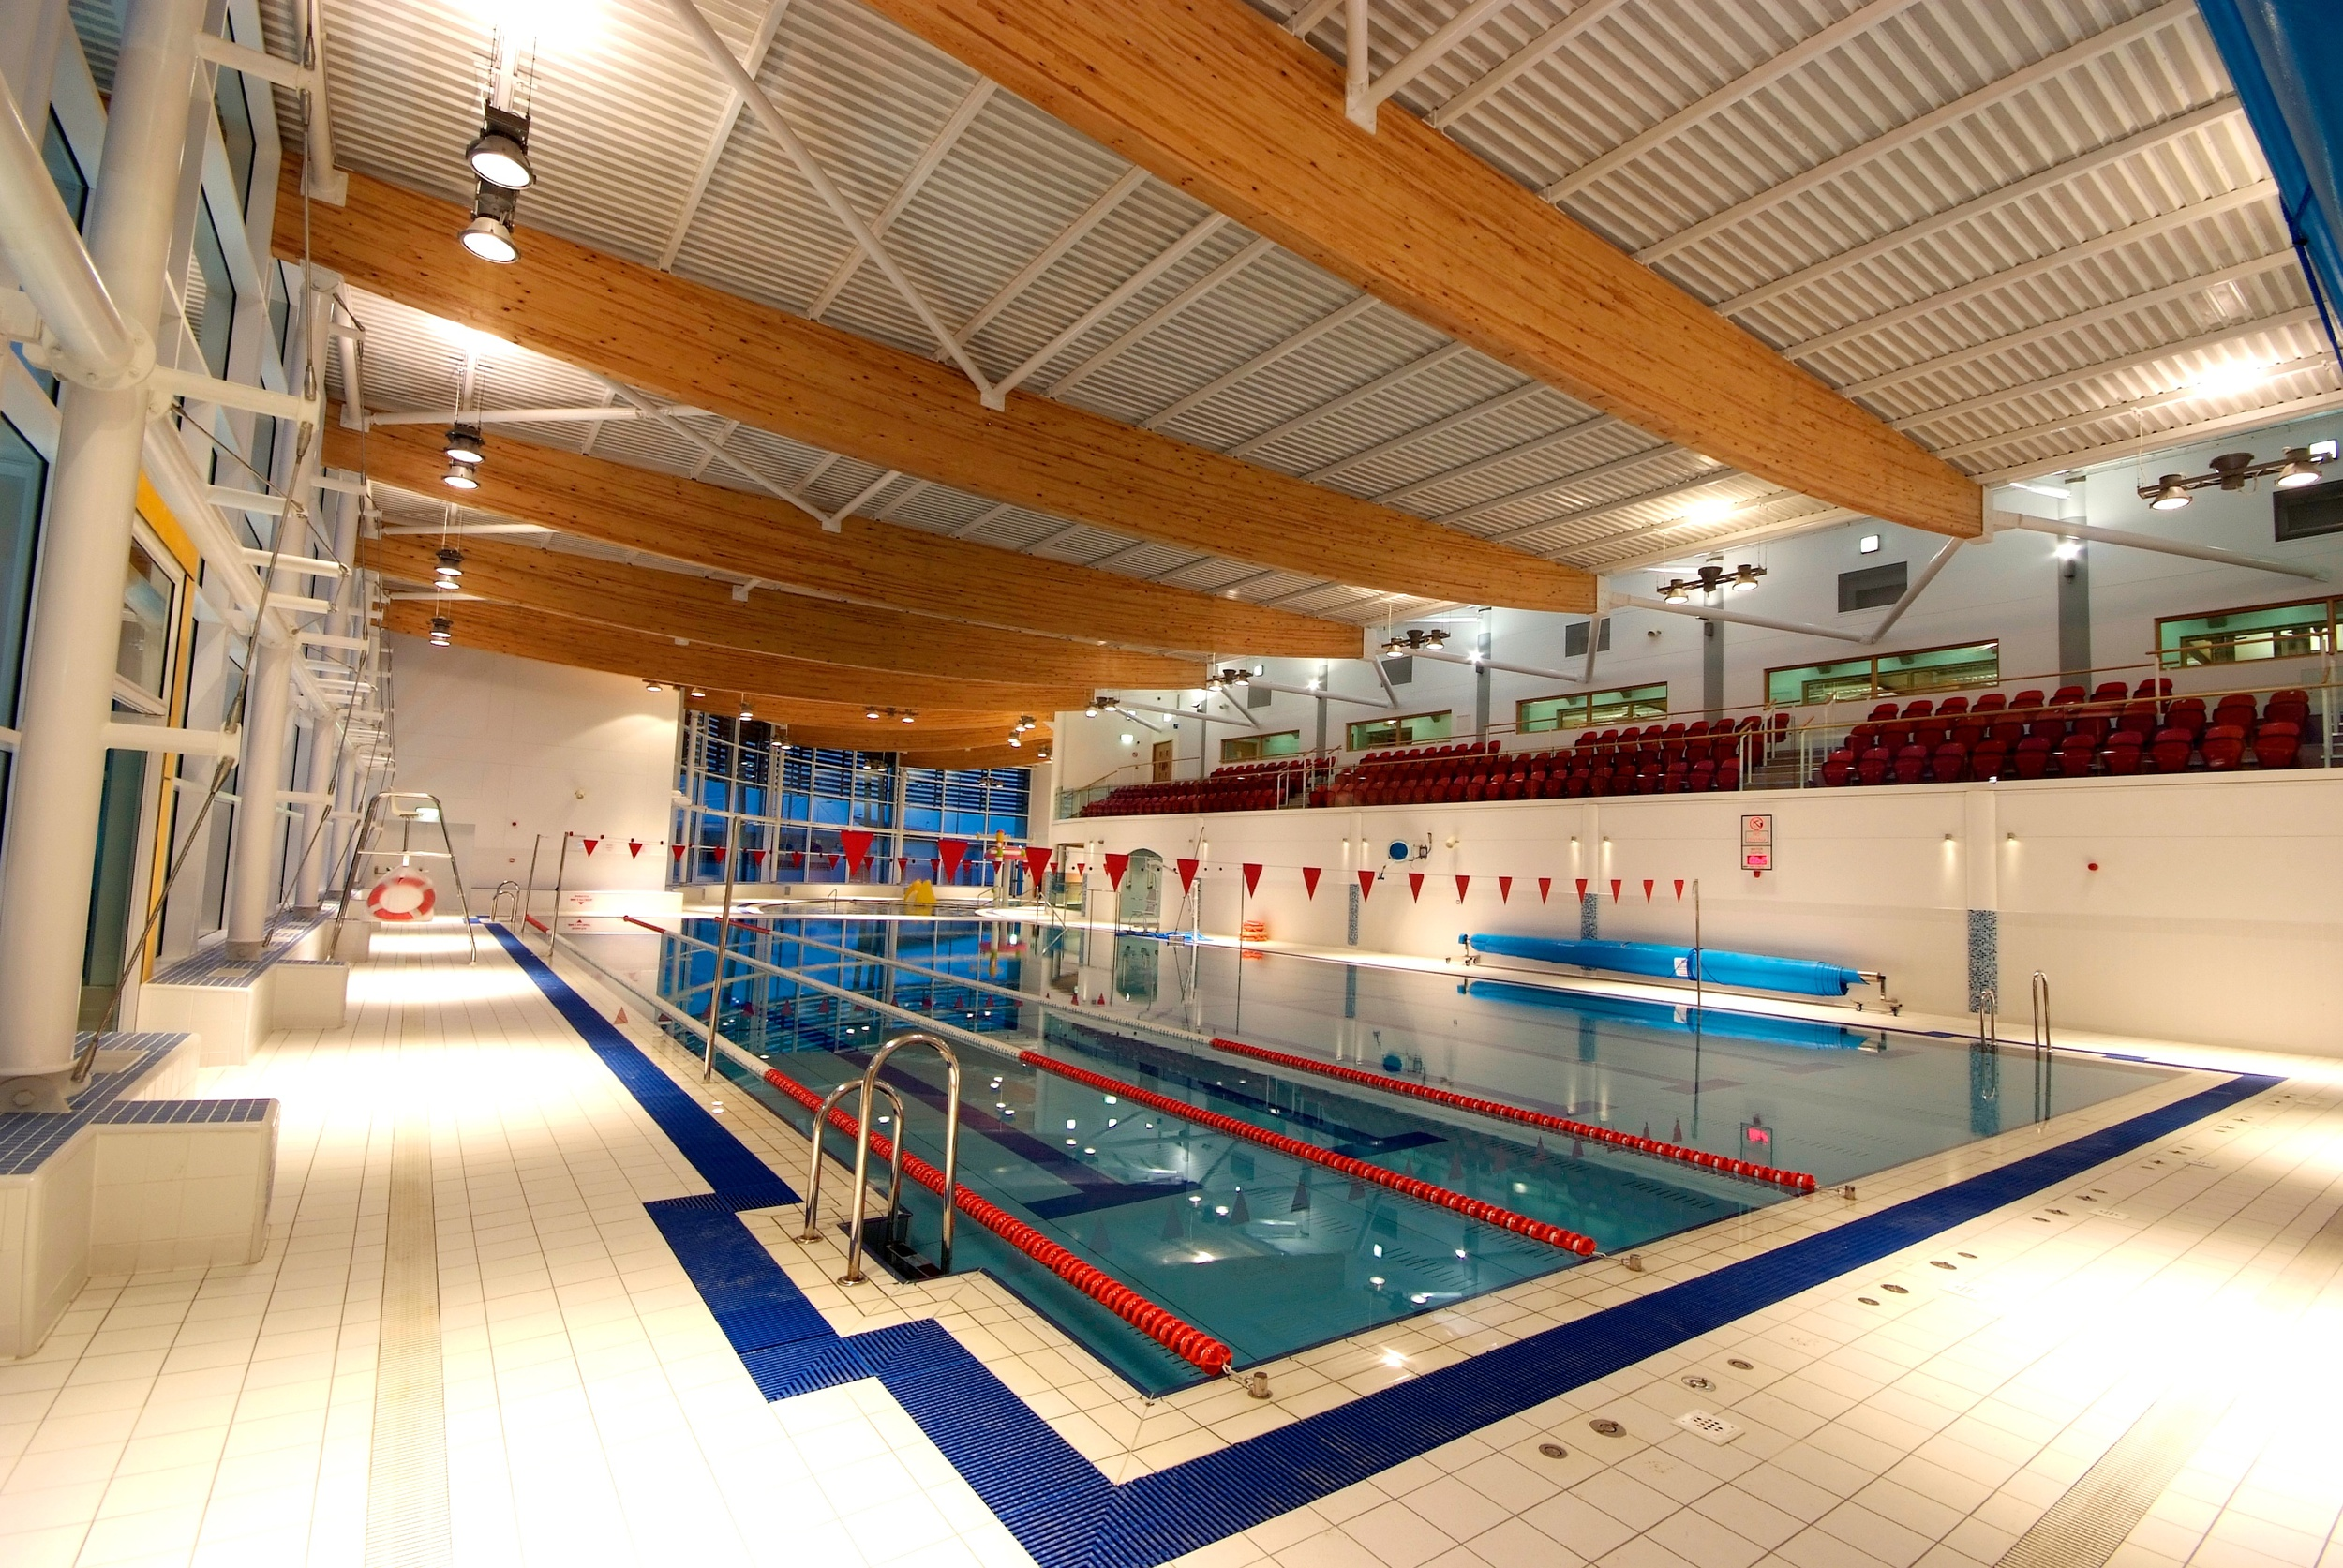 Leisure Centre, Kilkenny